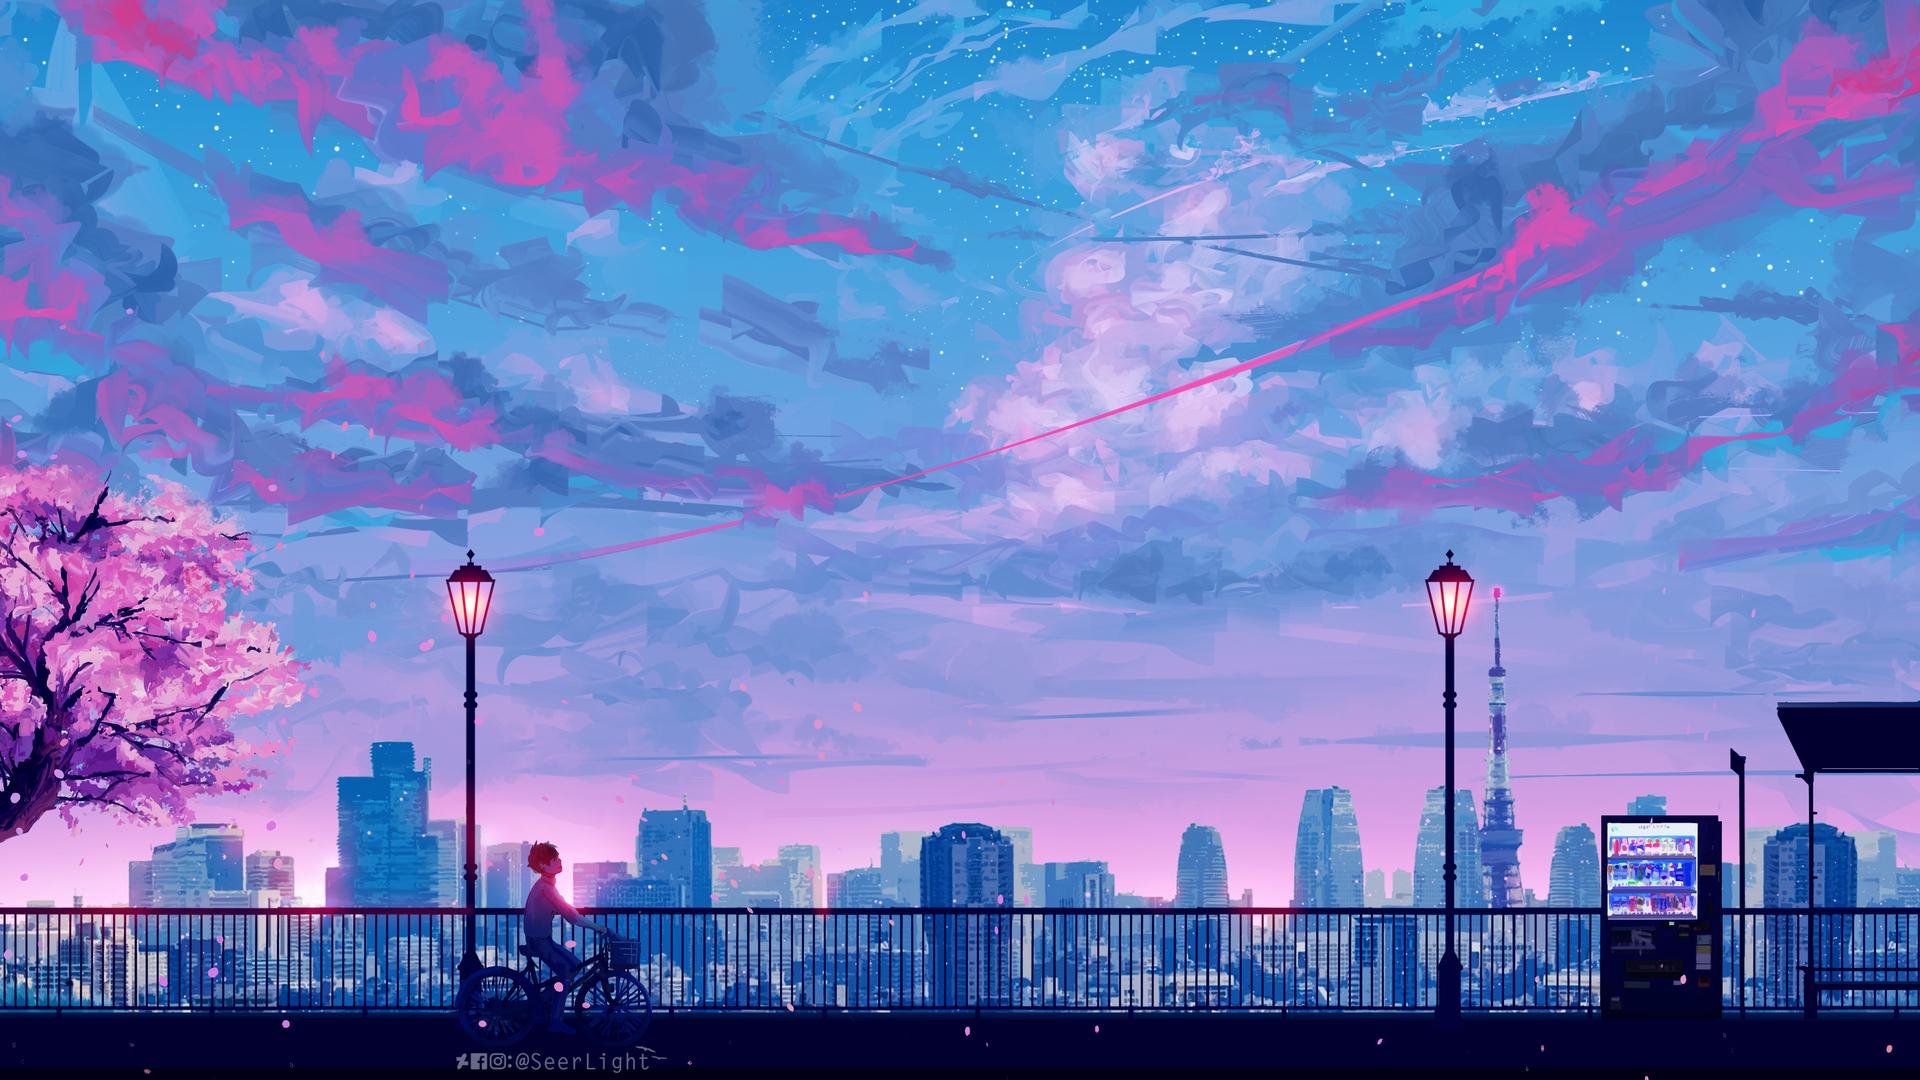 Gambar Wallpaper Cute 1920x1080 Anime Cityscape Landscape Scenery 5k Laptop Full